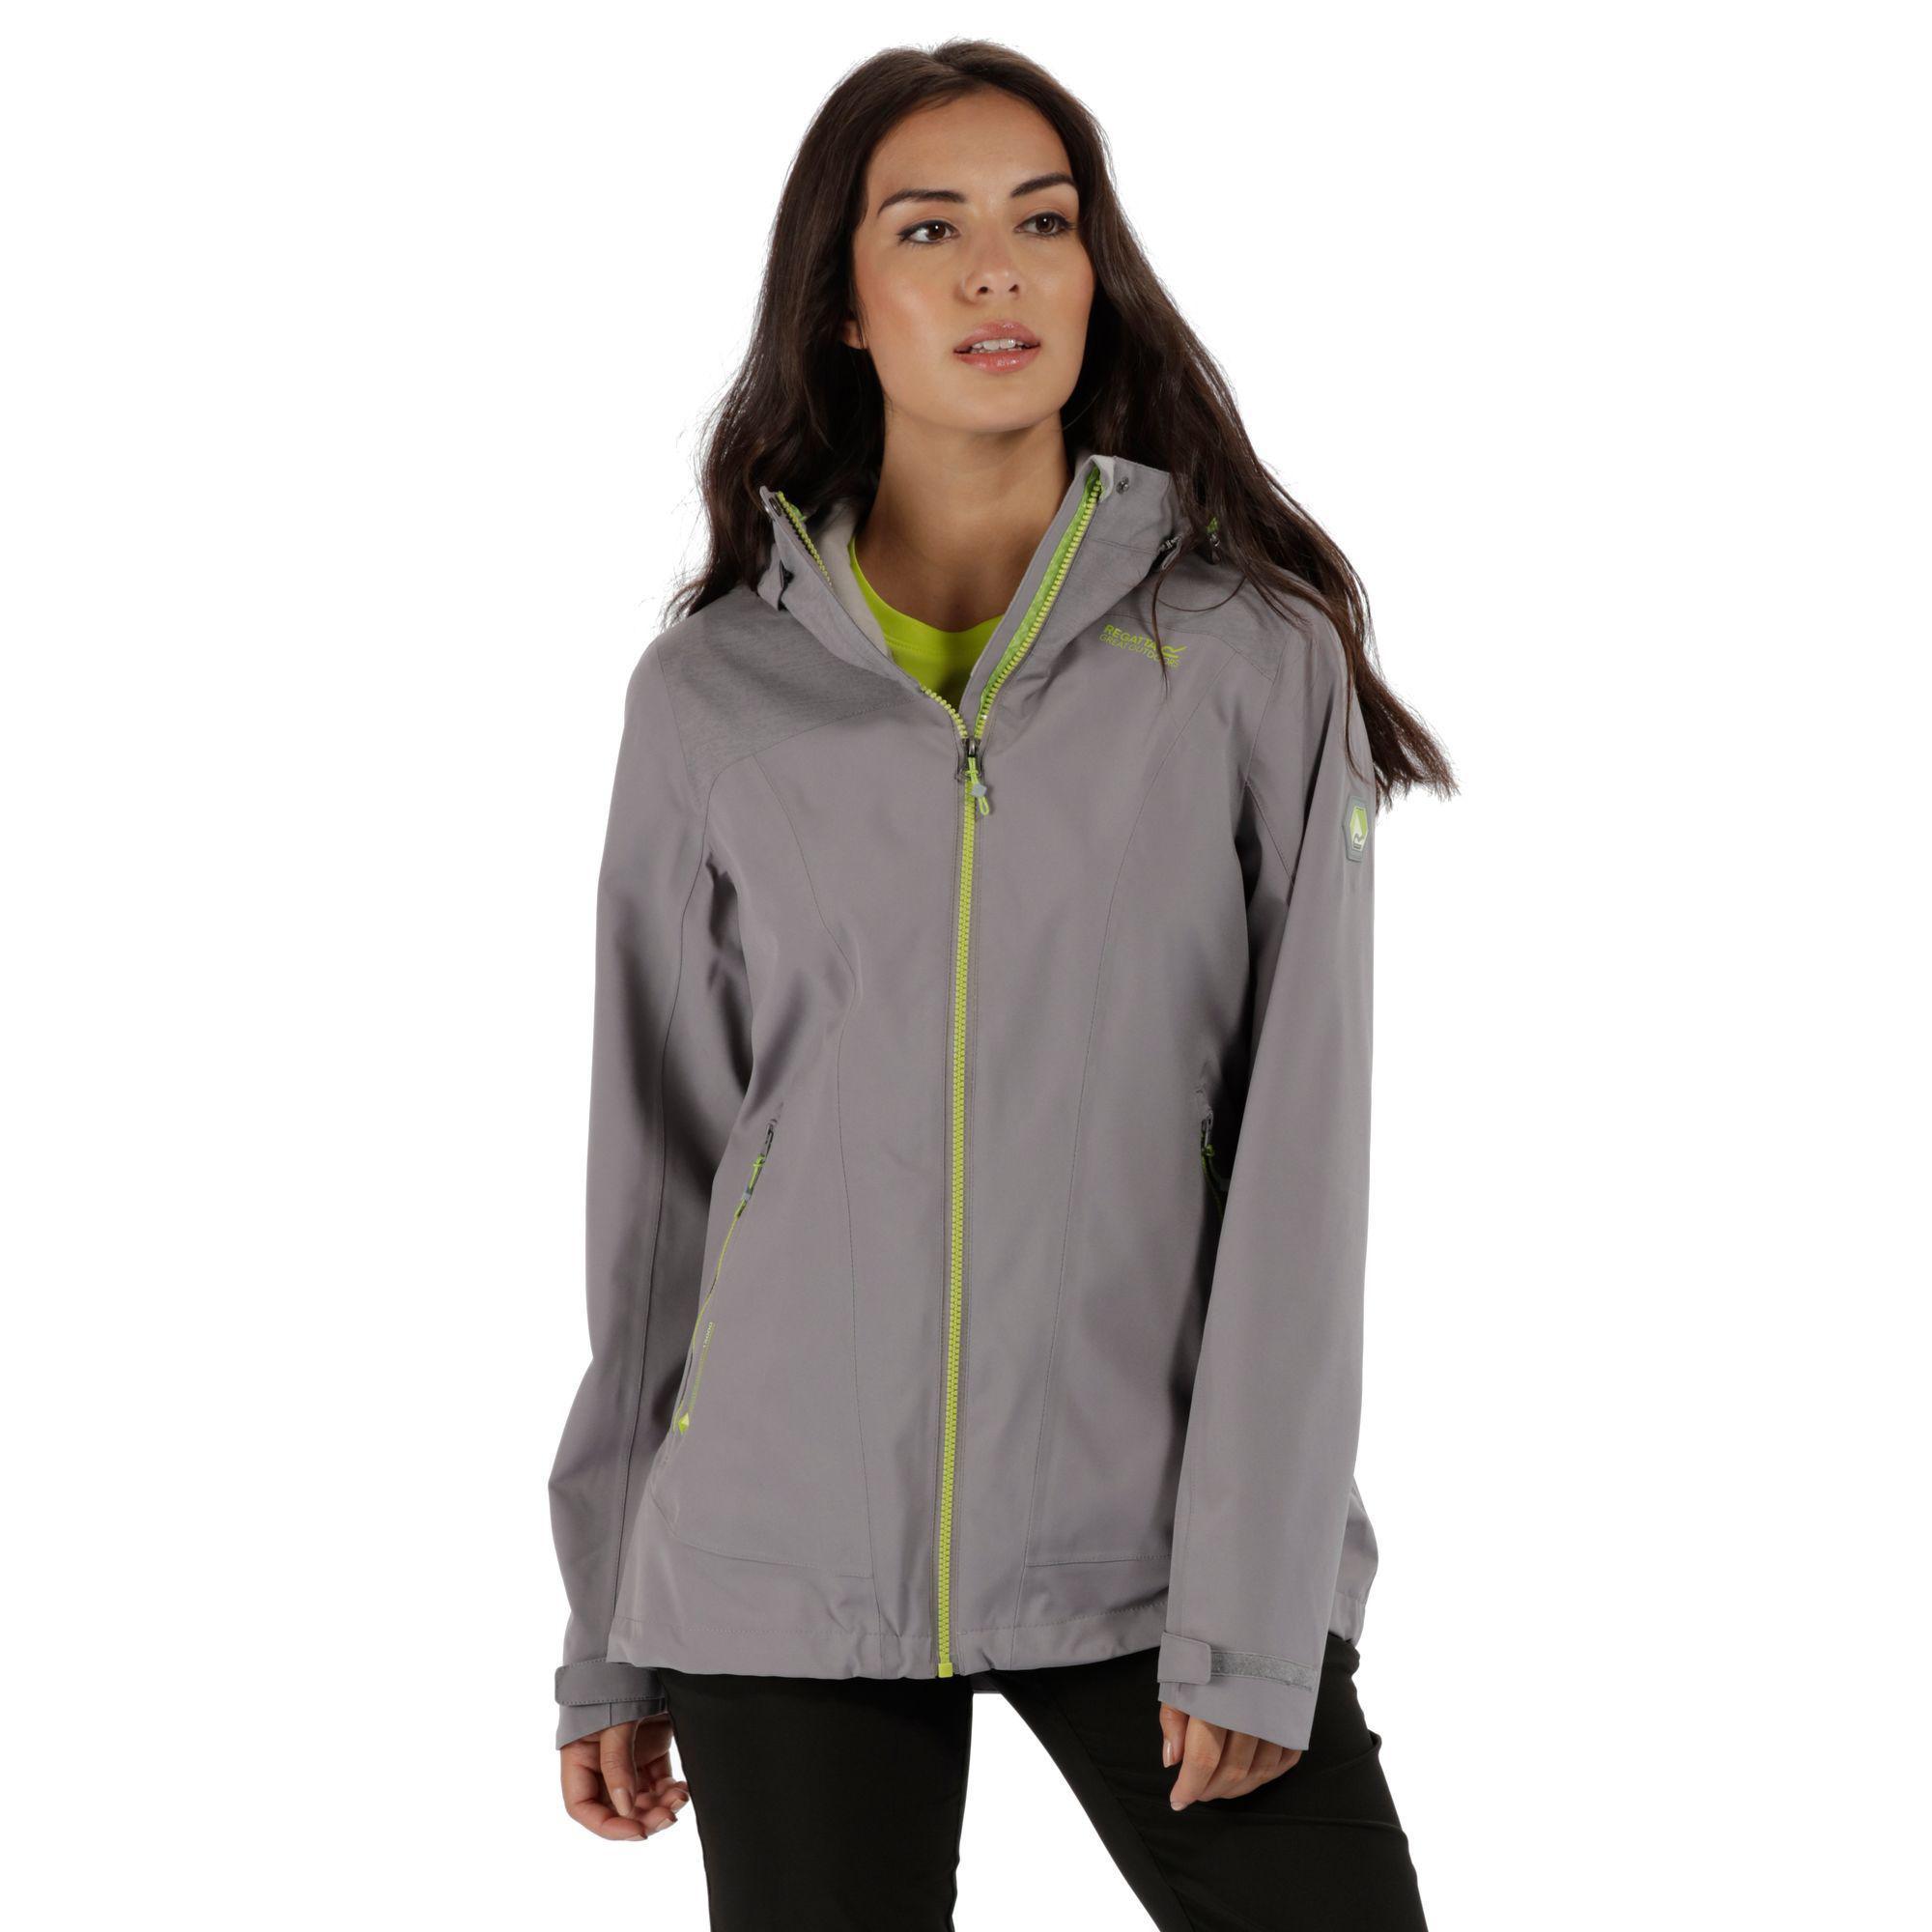 Regatta Ladies Carletta II Waterproof Breathable Walking Jacket Aqua Blue//Grey